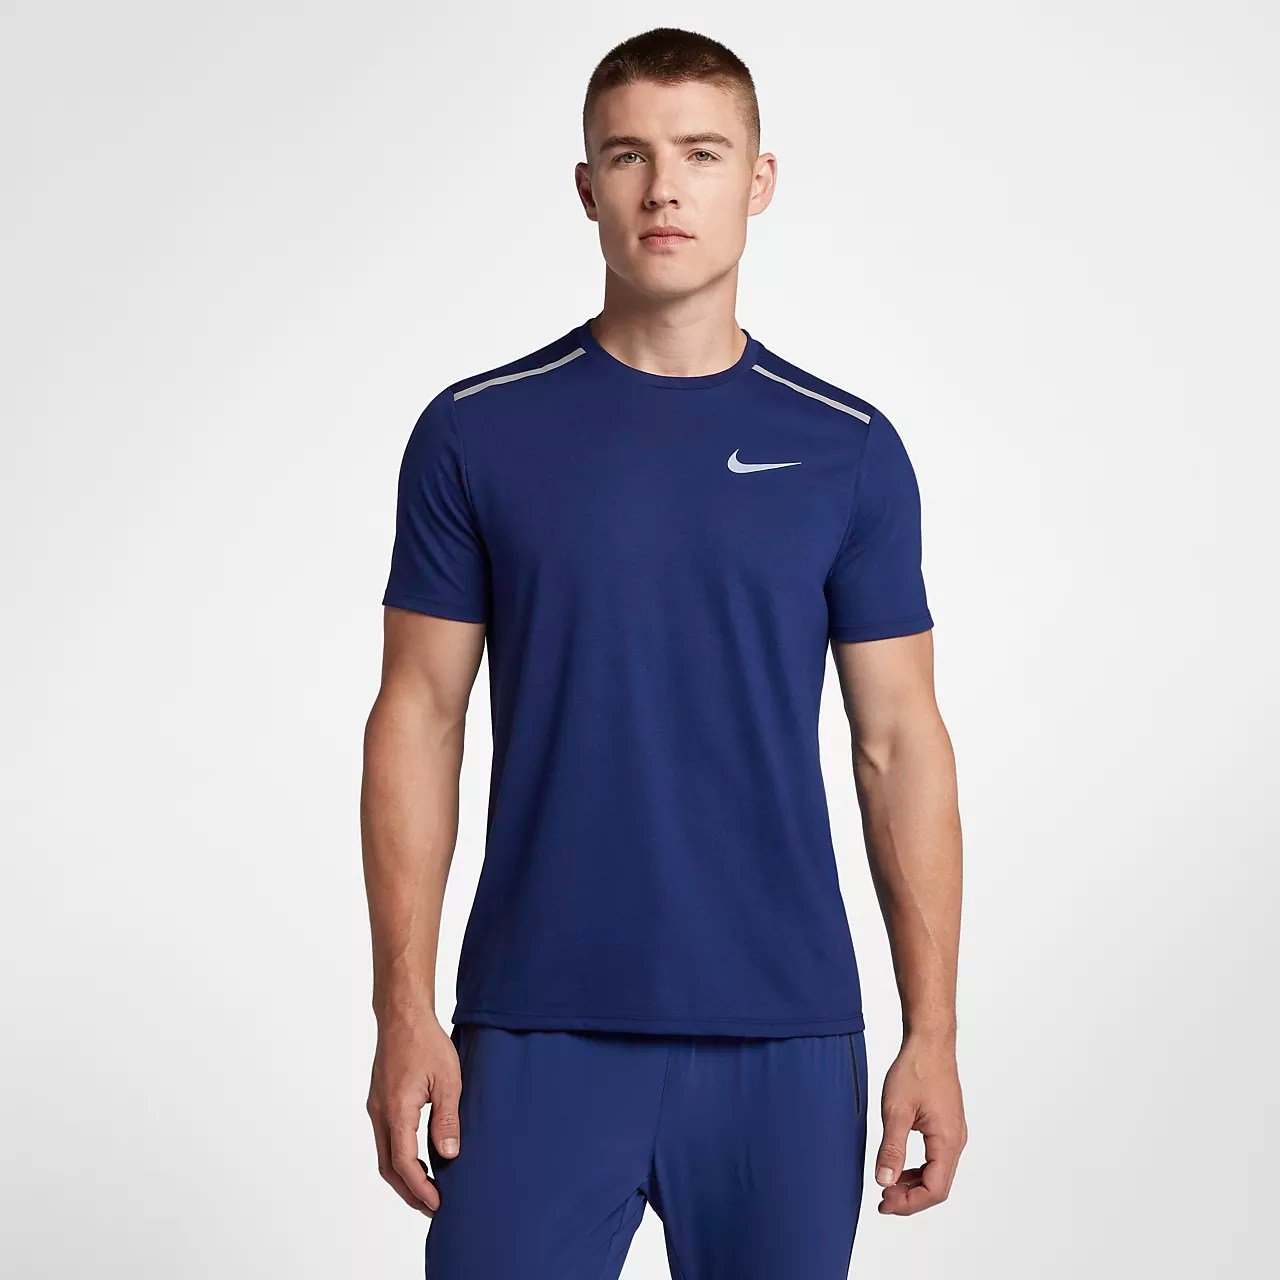 Nike Dri-FIT Rise 365 男款短袖跑步上衣。Nike TW